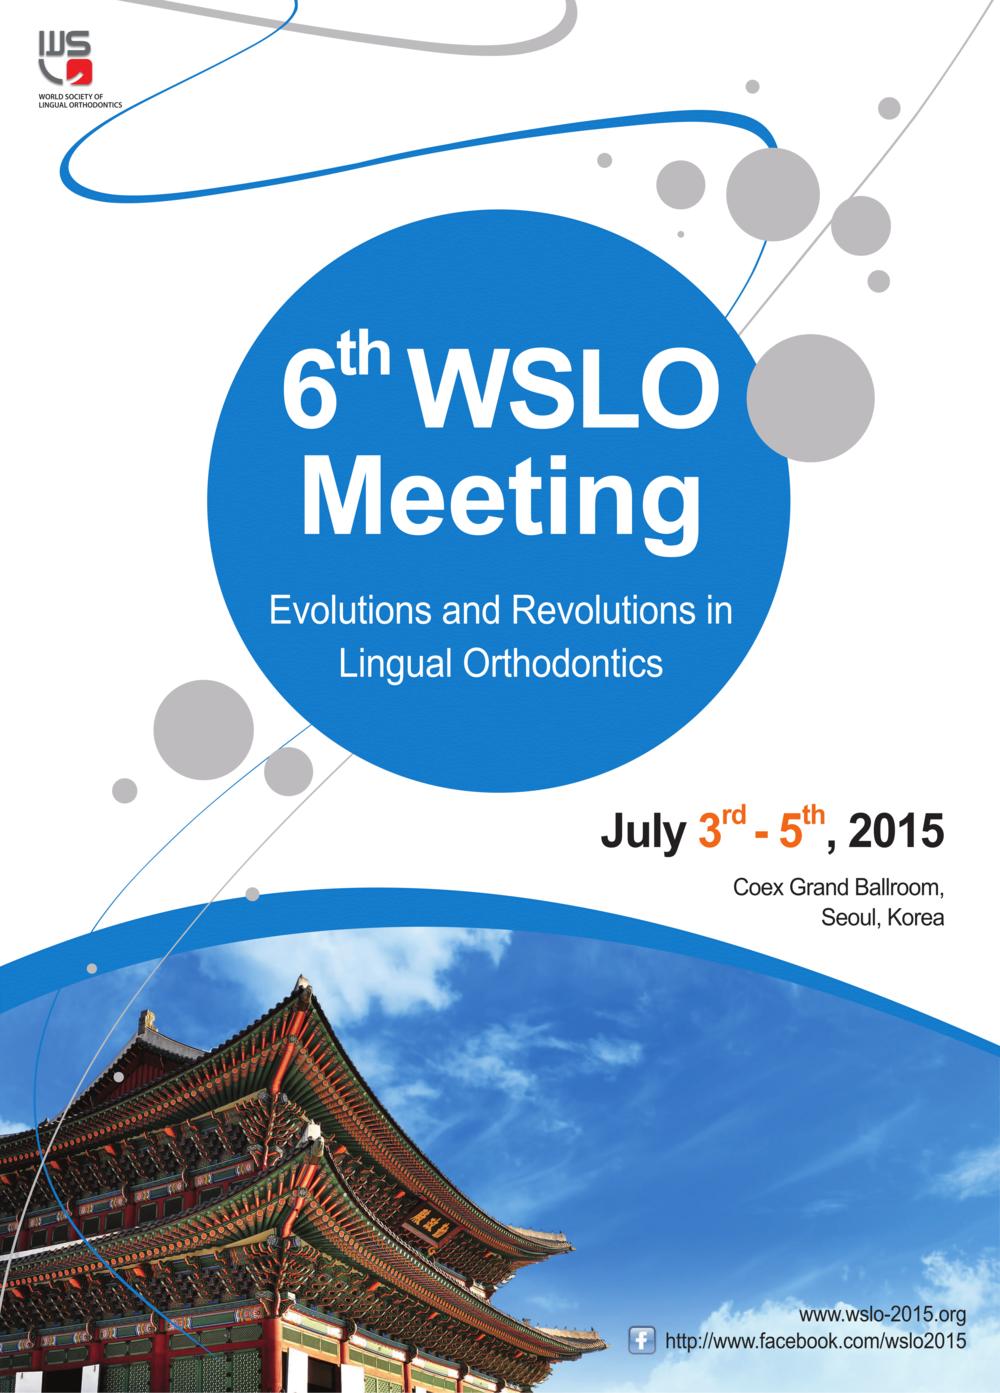 WSLO2015 메인포스터-1.png